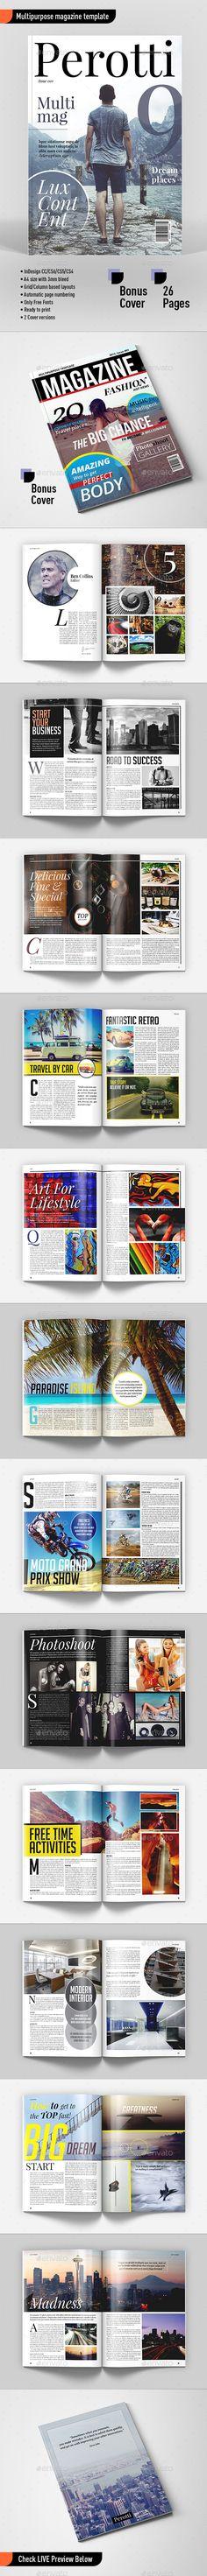 Multipurpose Magazine Template #design Download: http://graphicriver.net/item/multipurpose-magazine-template/11922680?ref=ksioks